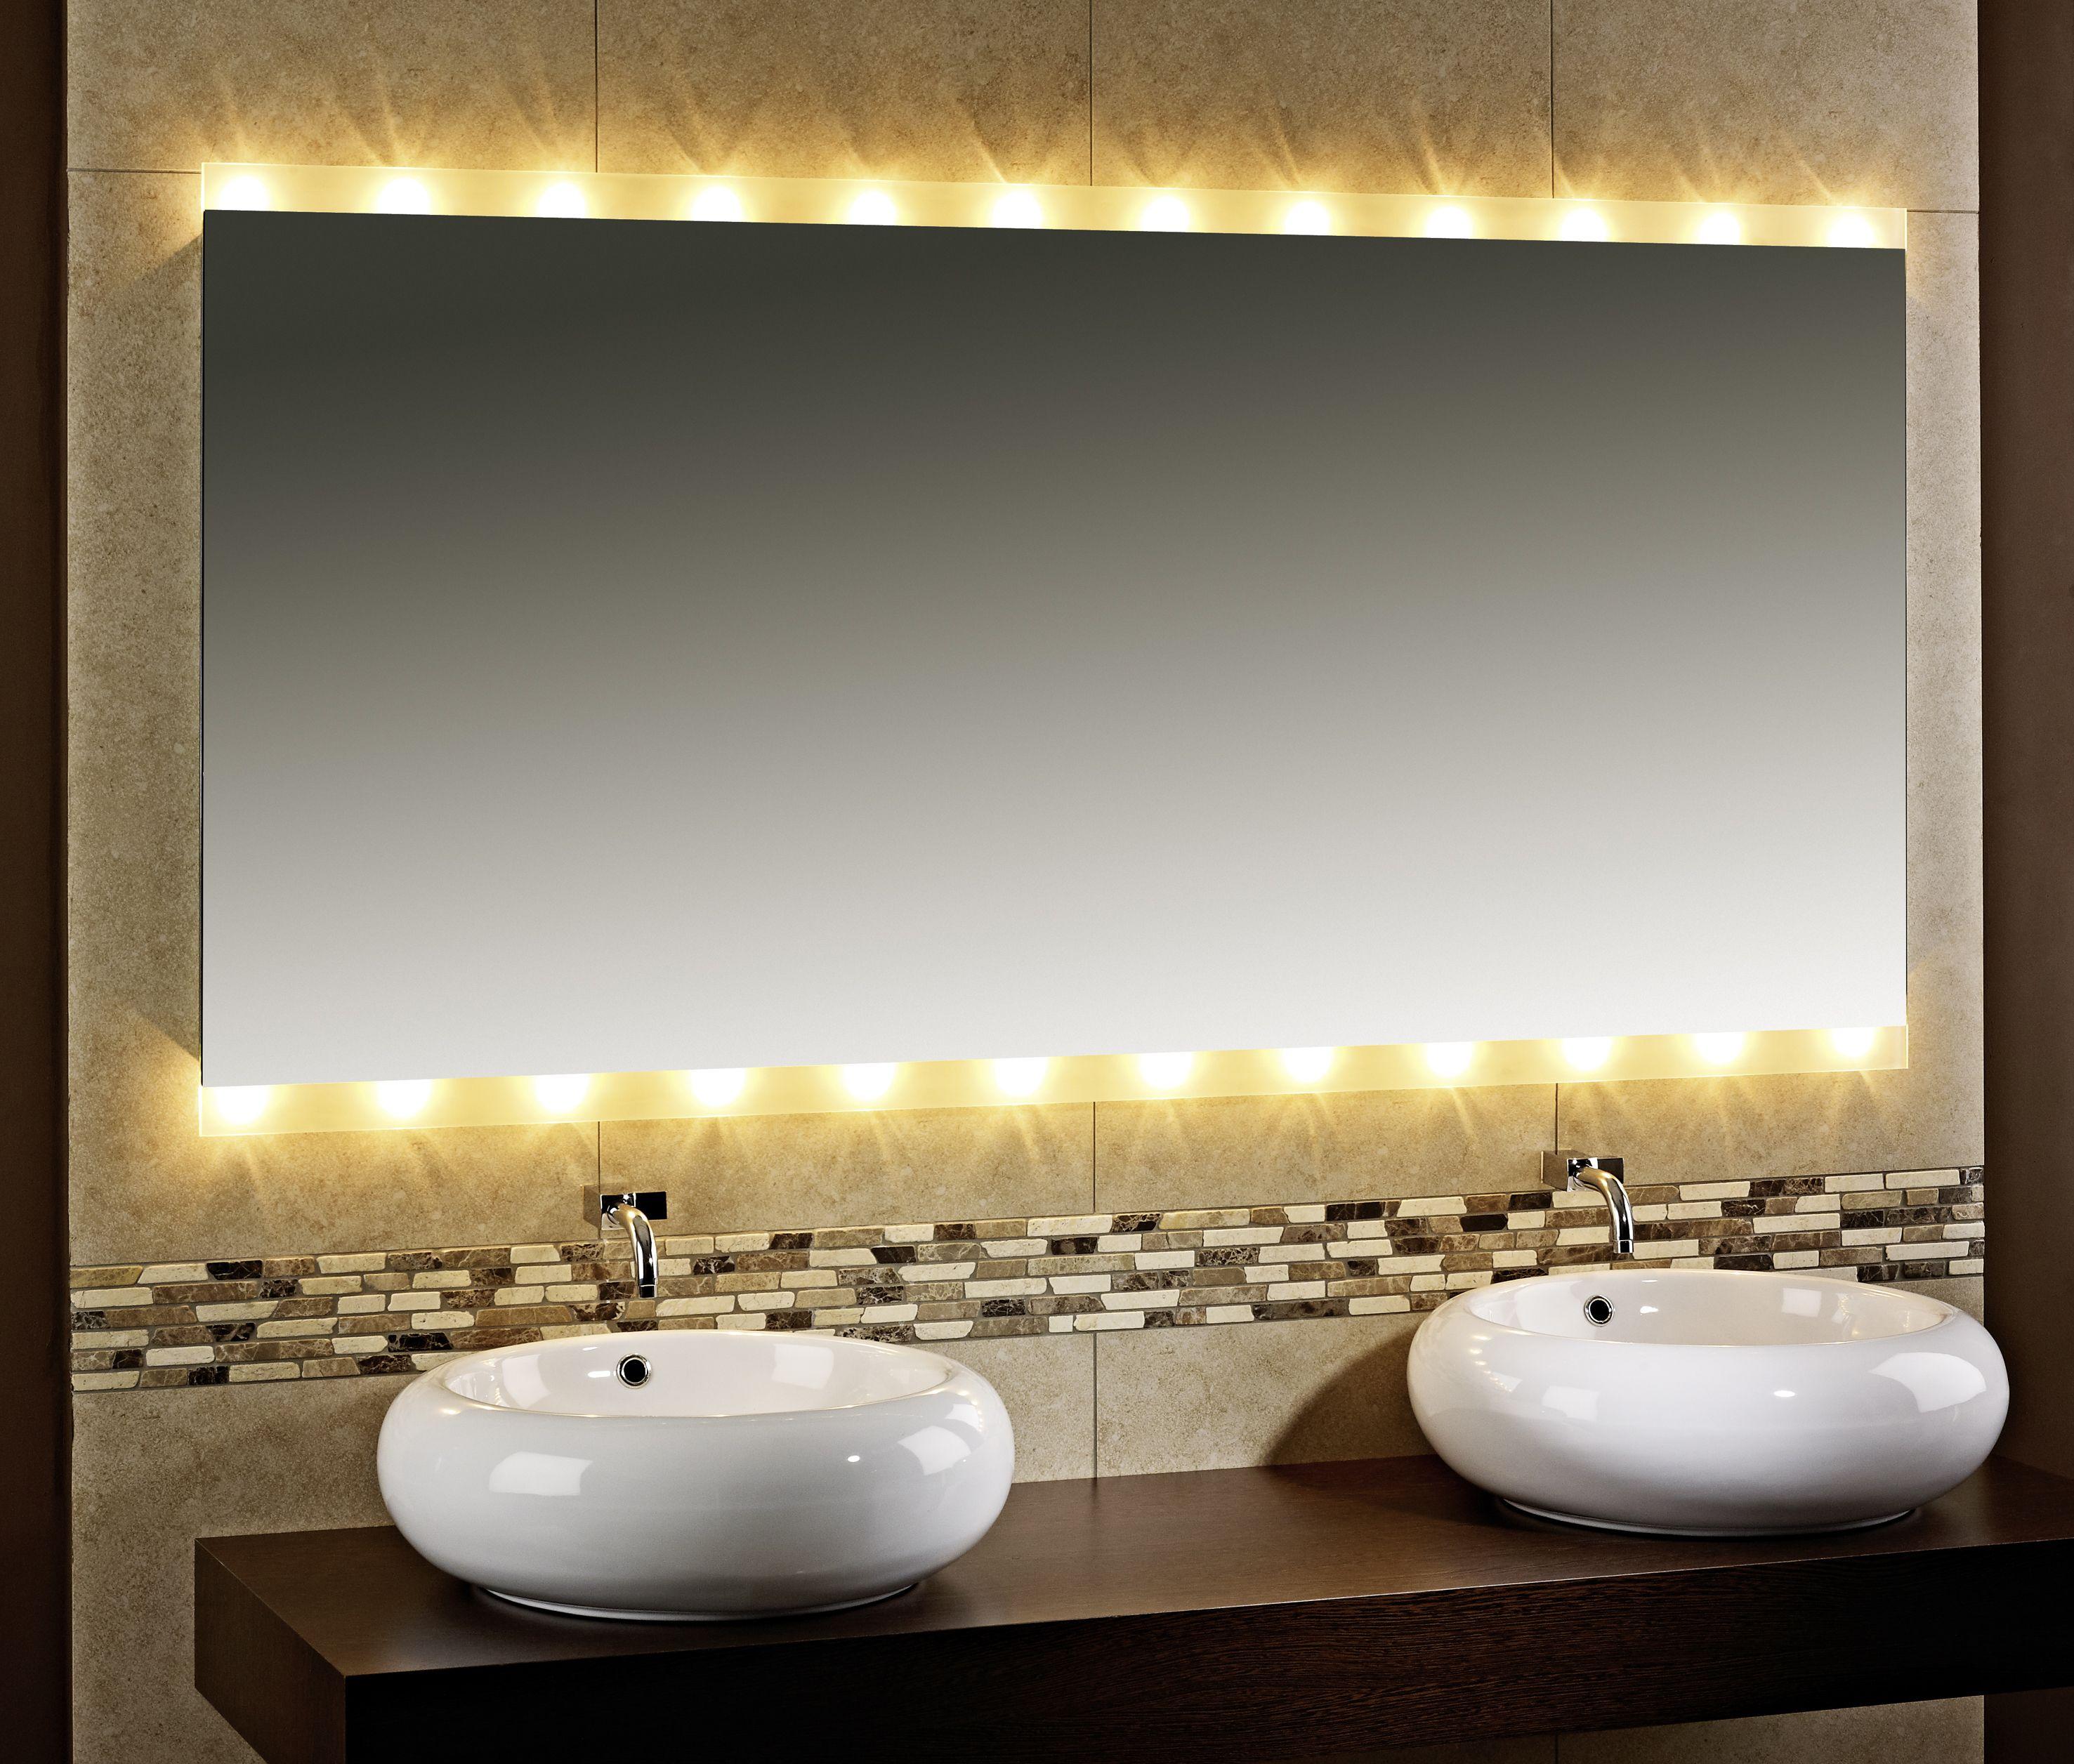 50d99737dcf586cfb03c1814a2709a74 Elegantes Spiegel Mit Indirekter Beleuchtung Dekorationen